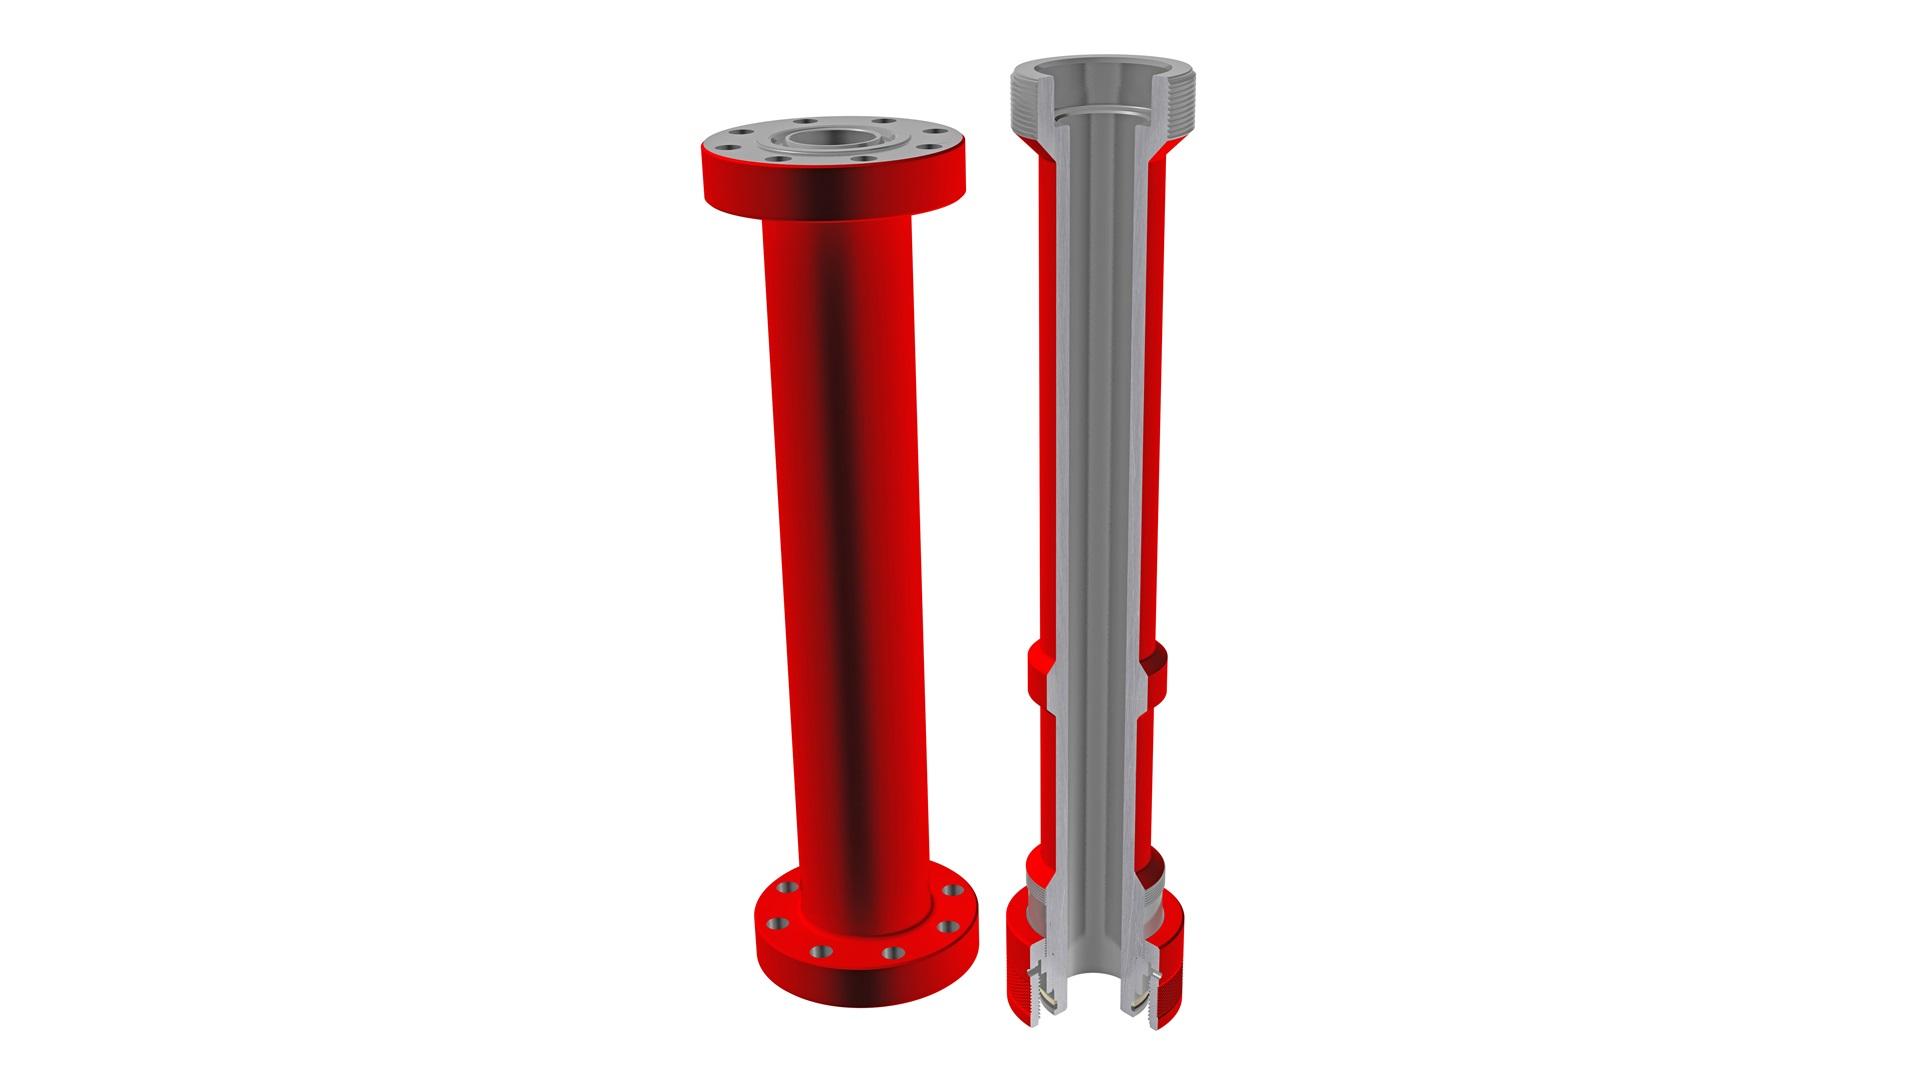 Render of  pressure control accessories